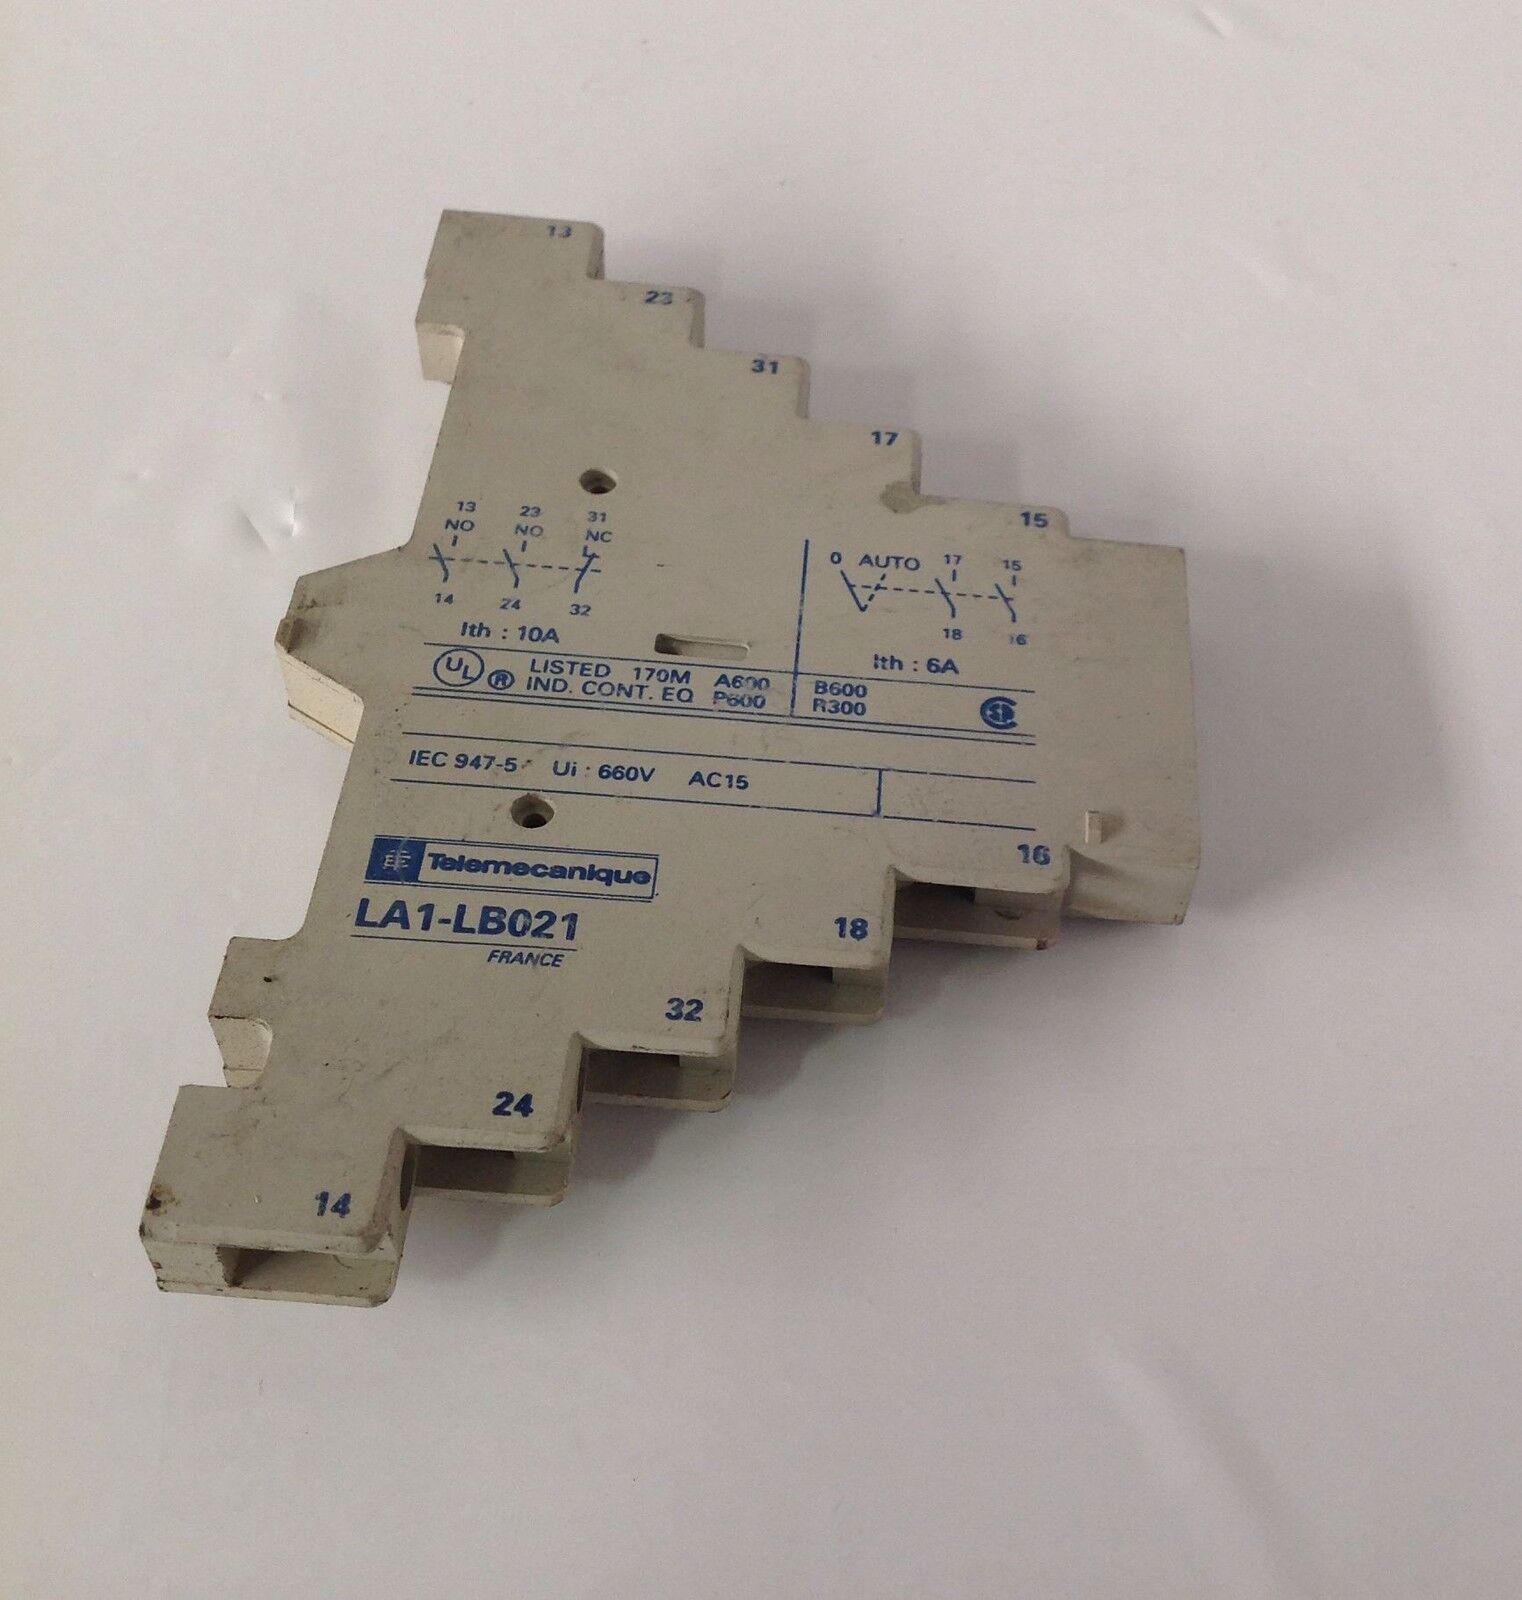 30T10//720 Timing Belt720mm Length 72 Teeth T10mm Pitch 30mm Width